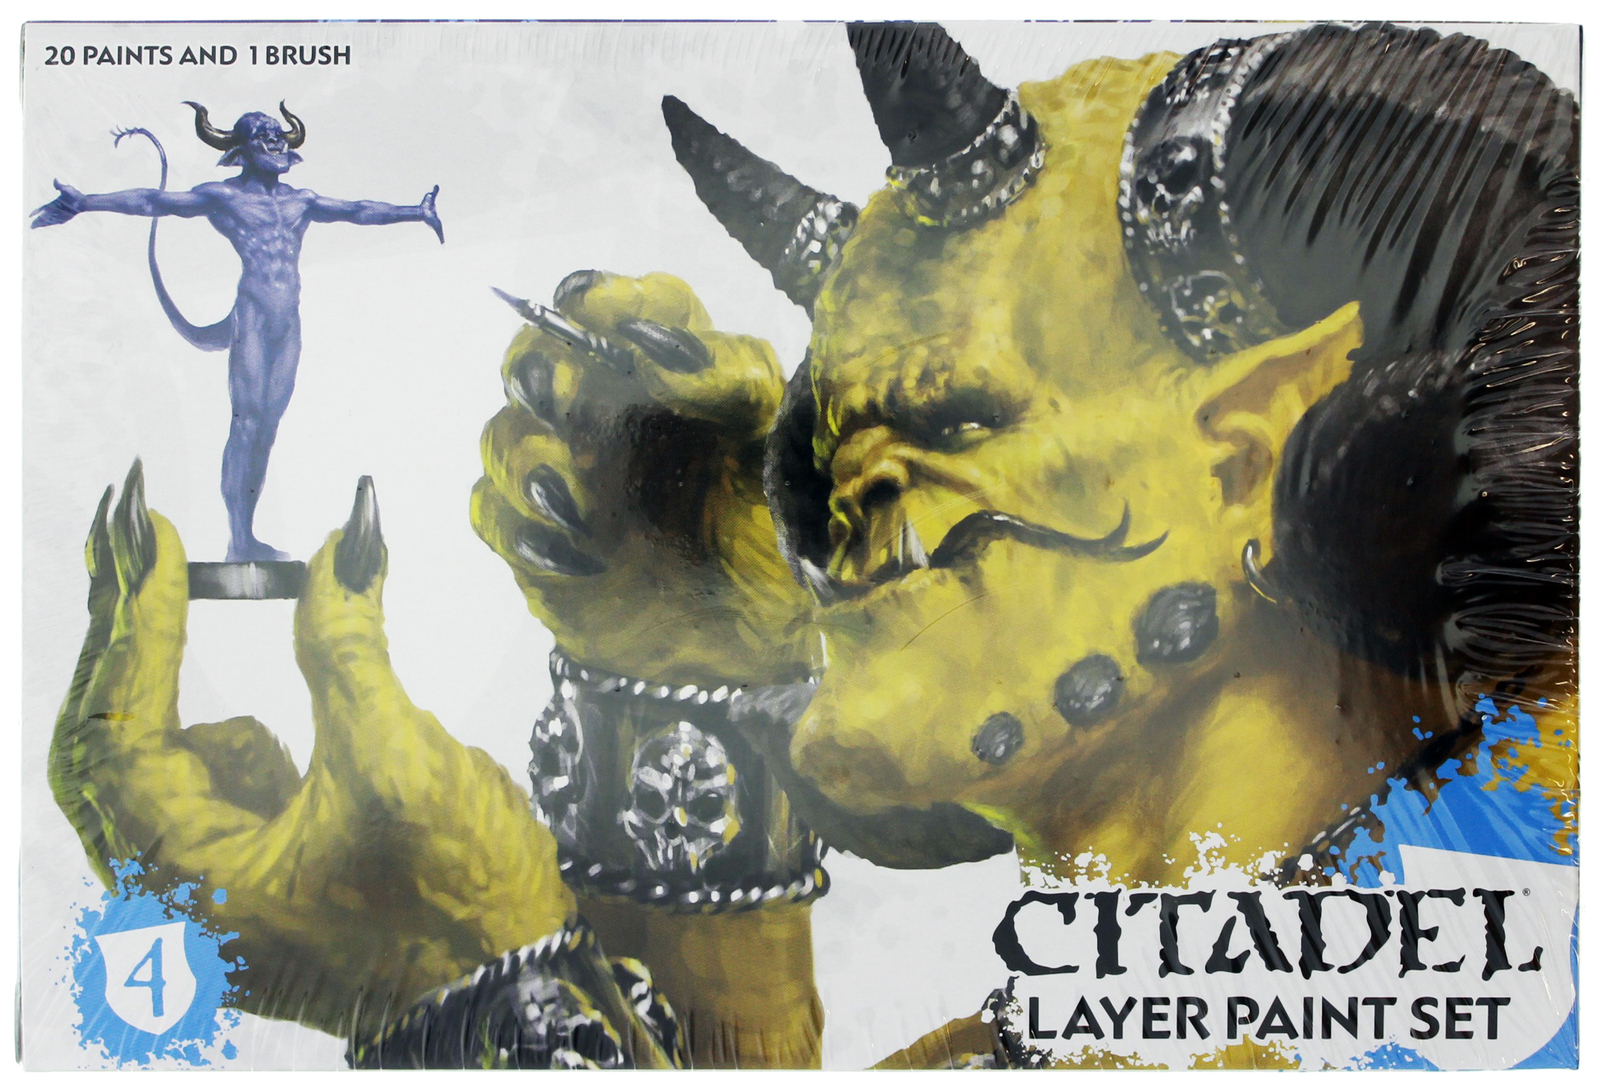 Citadel Layer Paint Set image